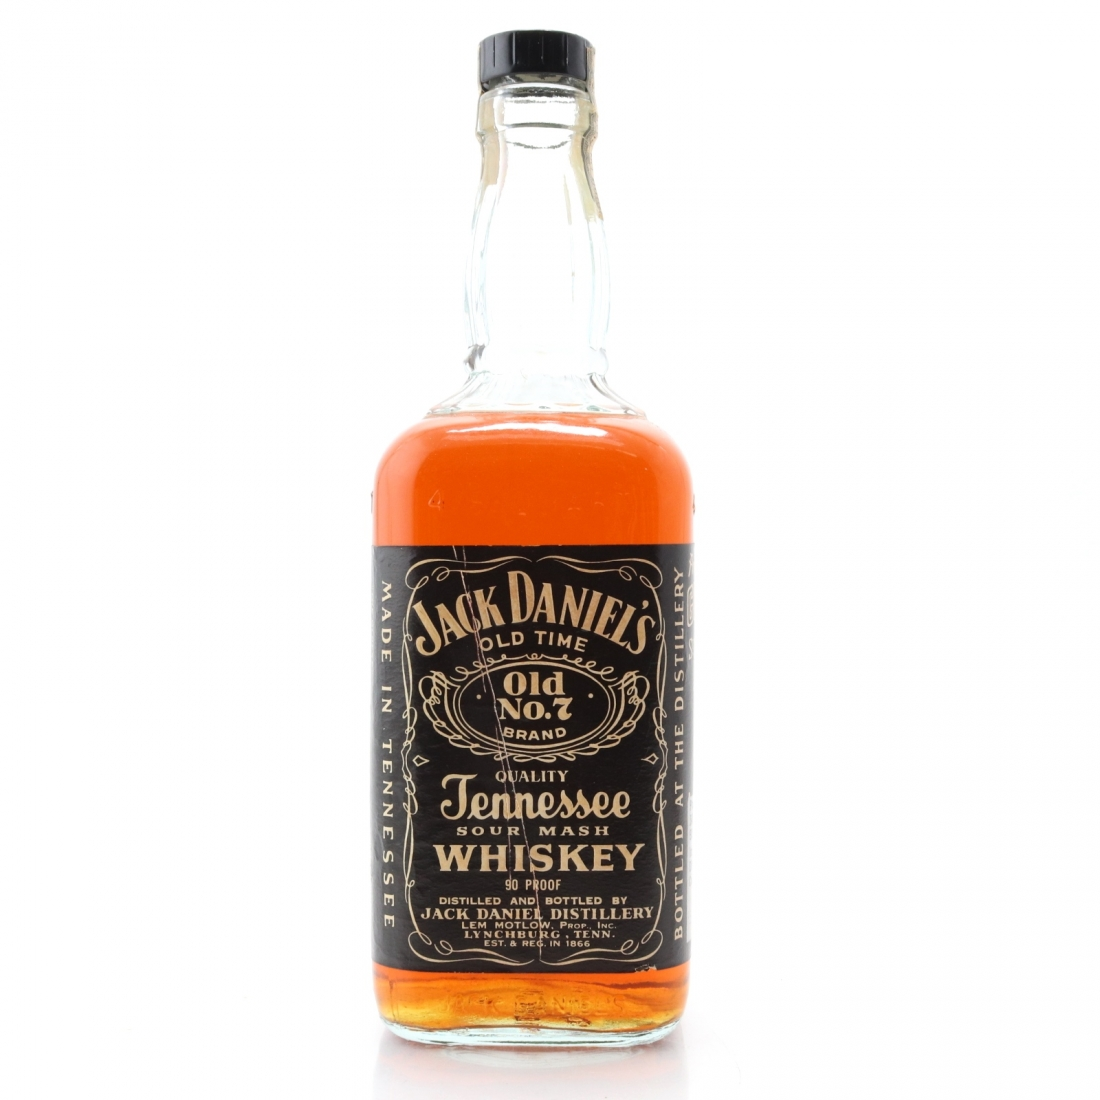 Jack Daniel's Old No.7 1970s